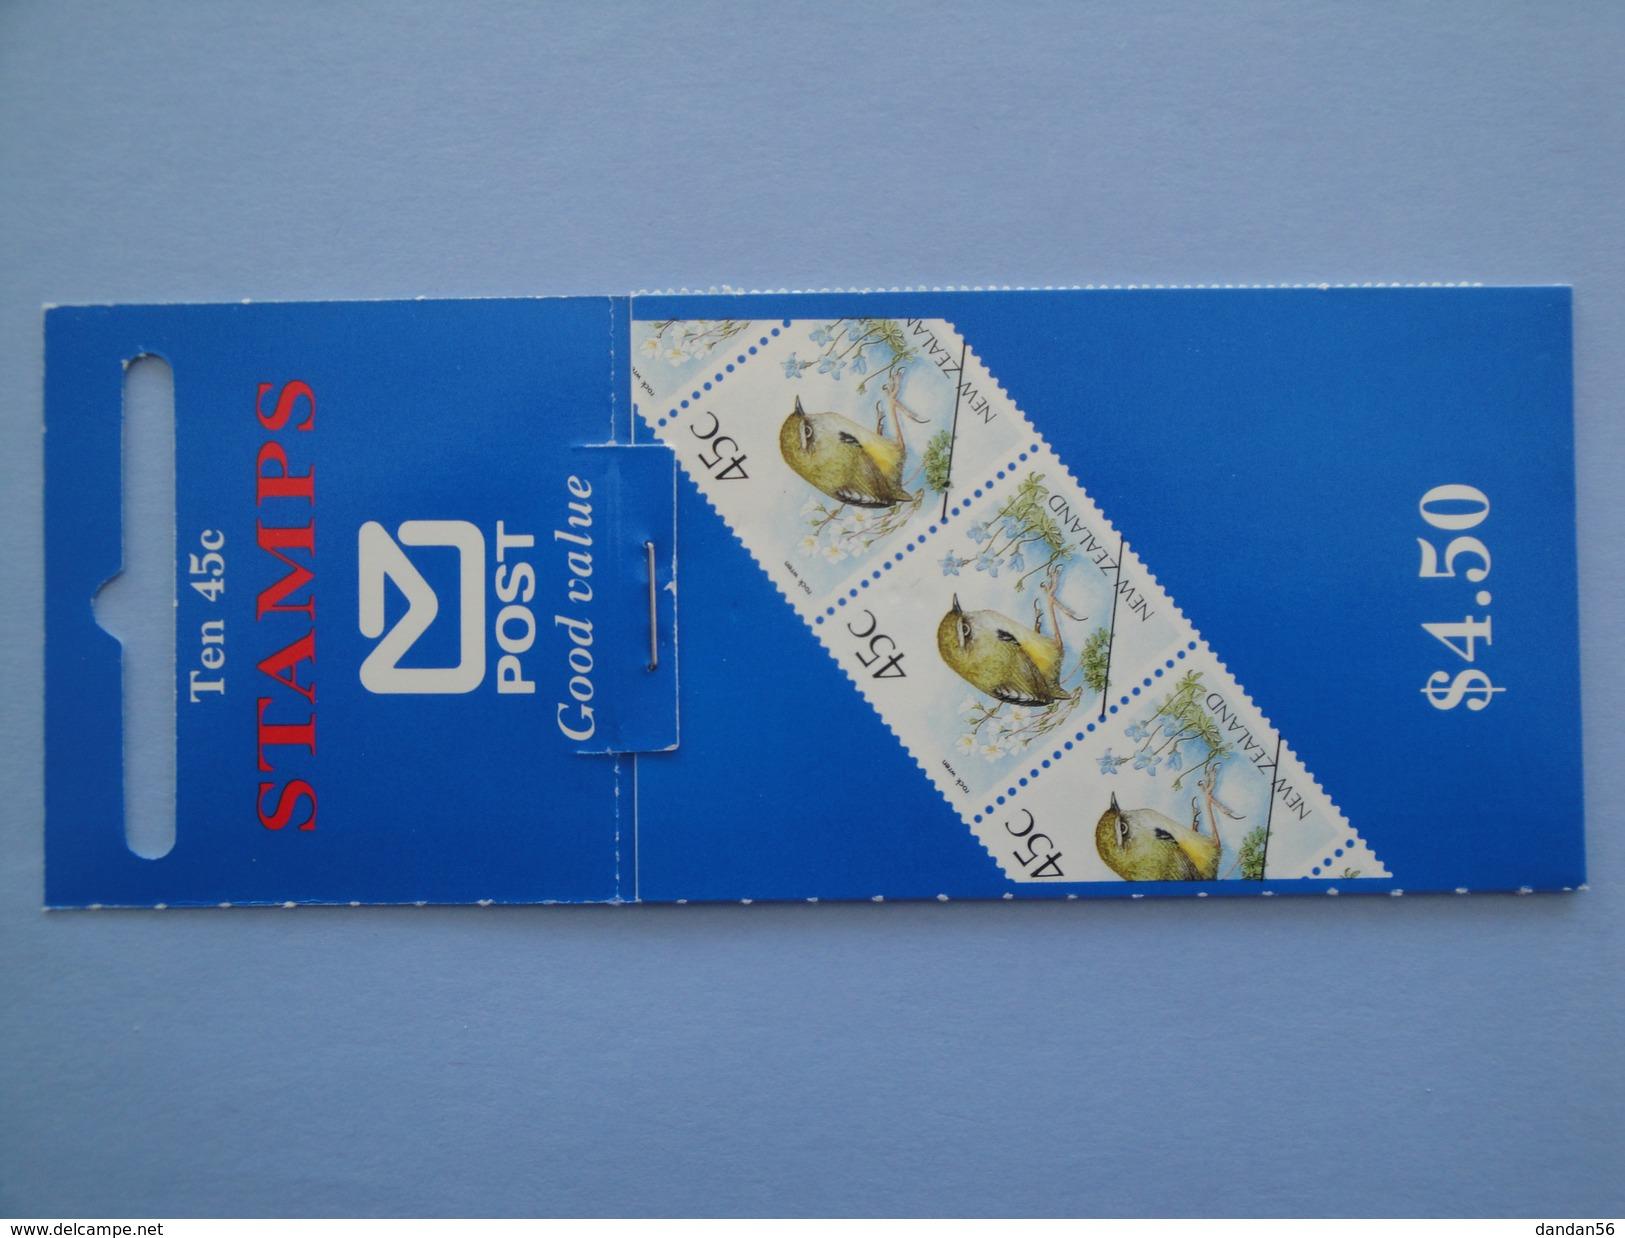 1991 Nouvelle Zélande - Yvert  C 1127  **  Oiseaux Birds Scott Xx   Michel C 1183 X 10   SG SB 59 ???? - Carnets